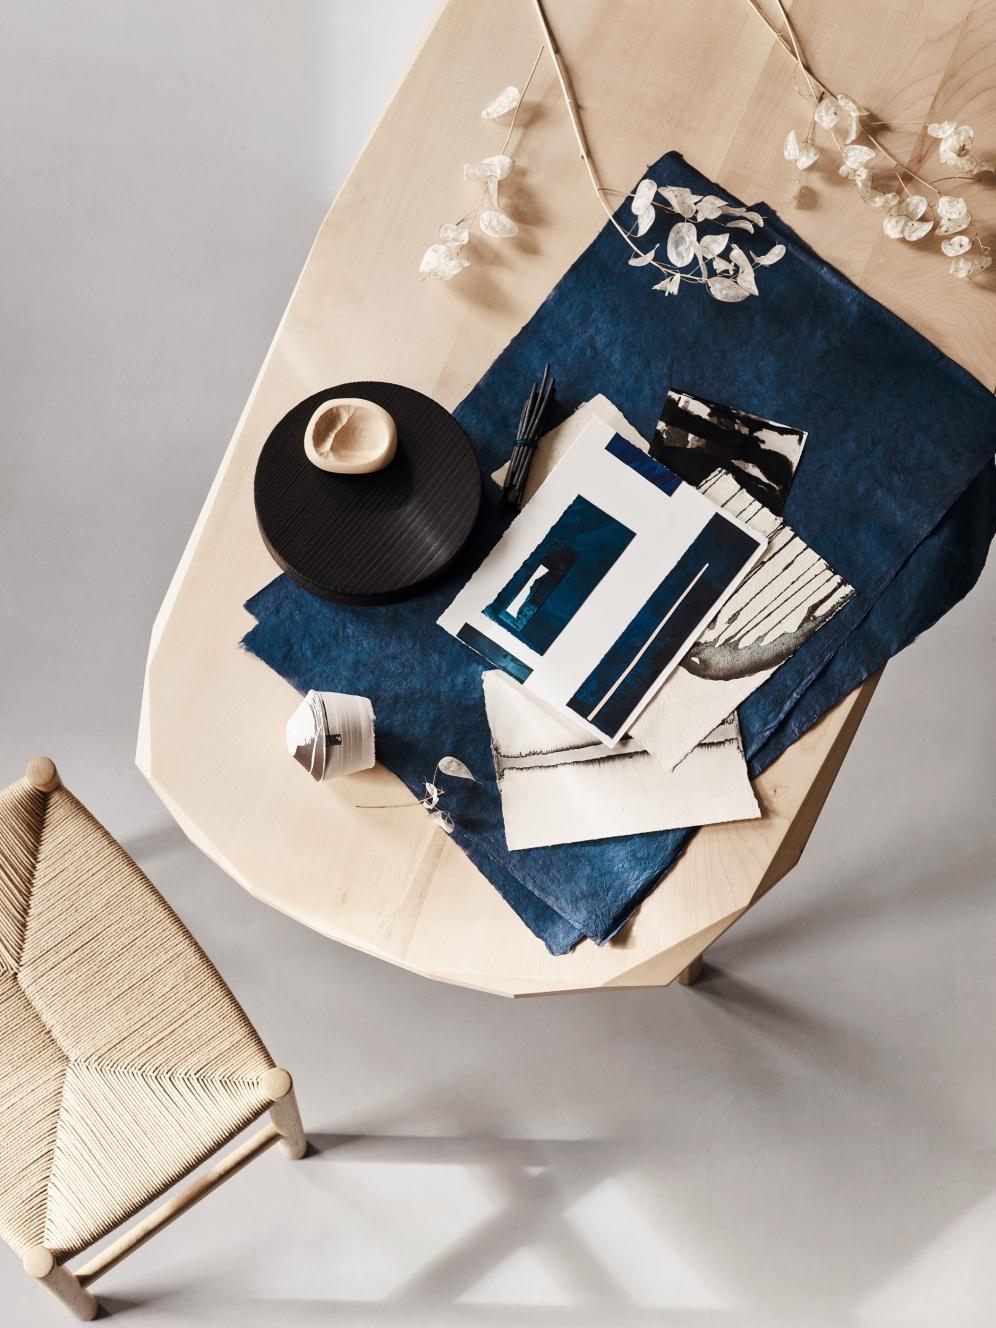 Elle Decoration | Paper and Ink